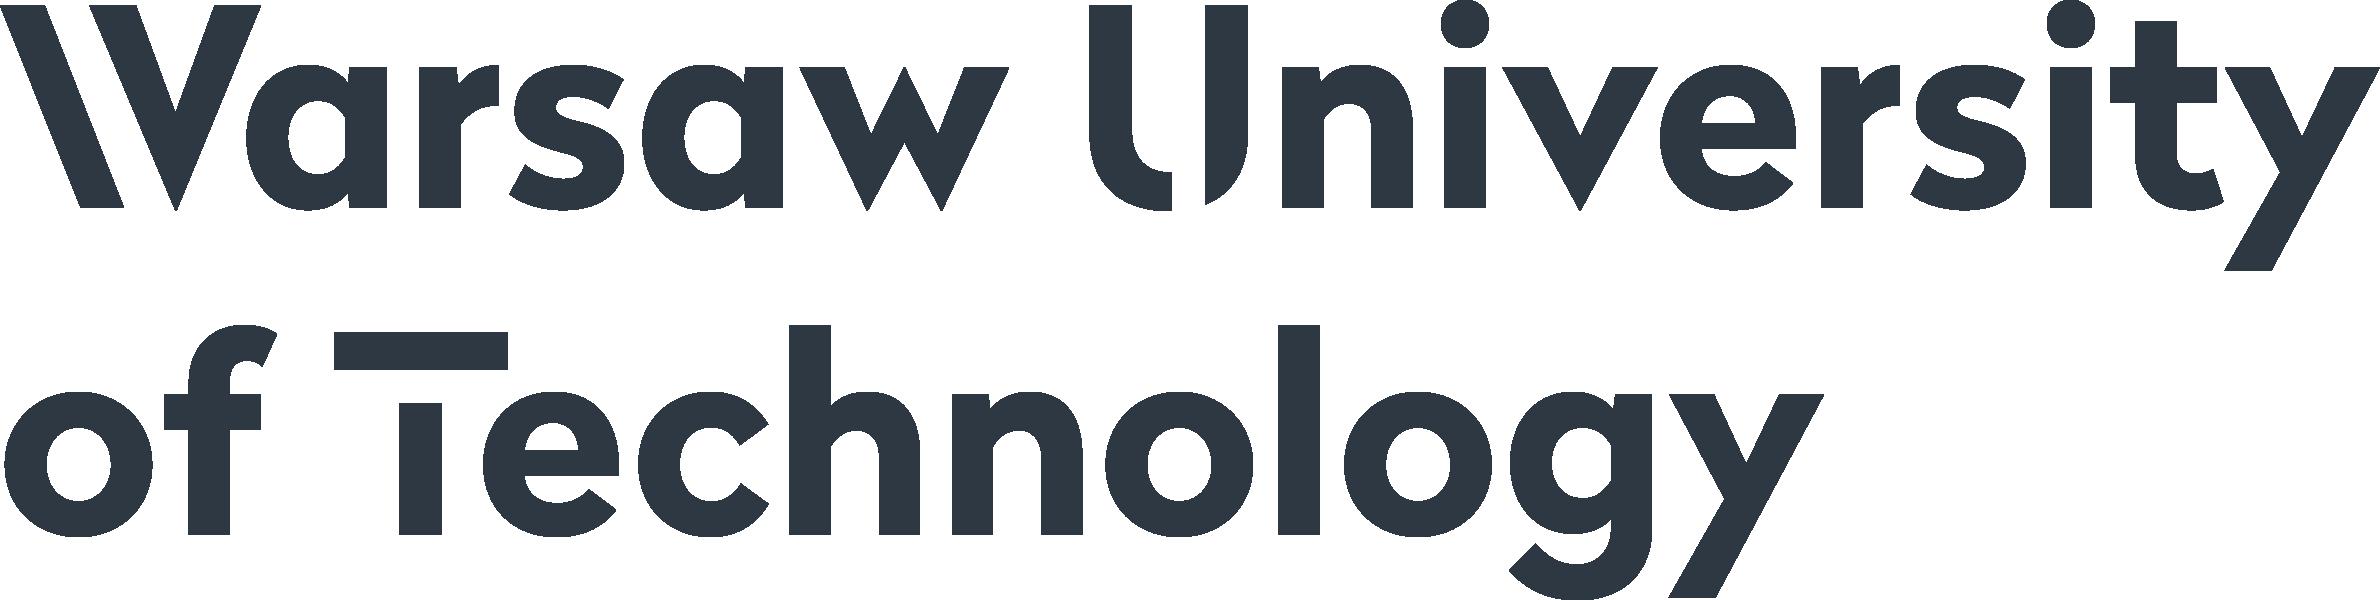 logo Warsaw University of Technology